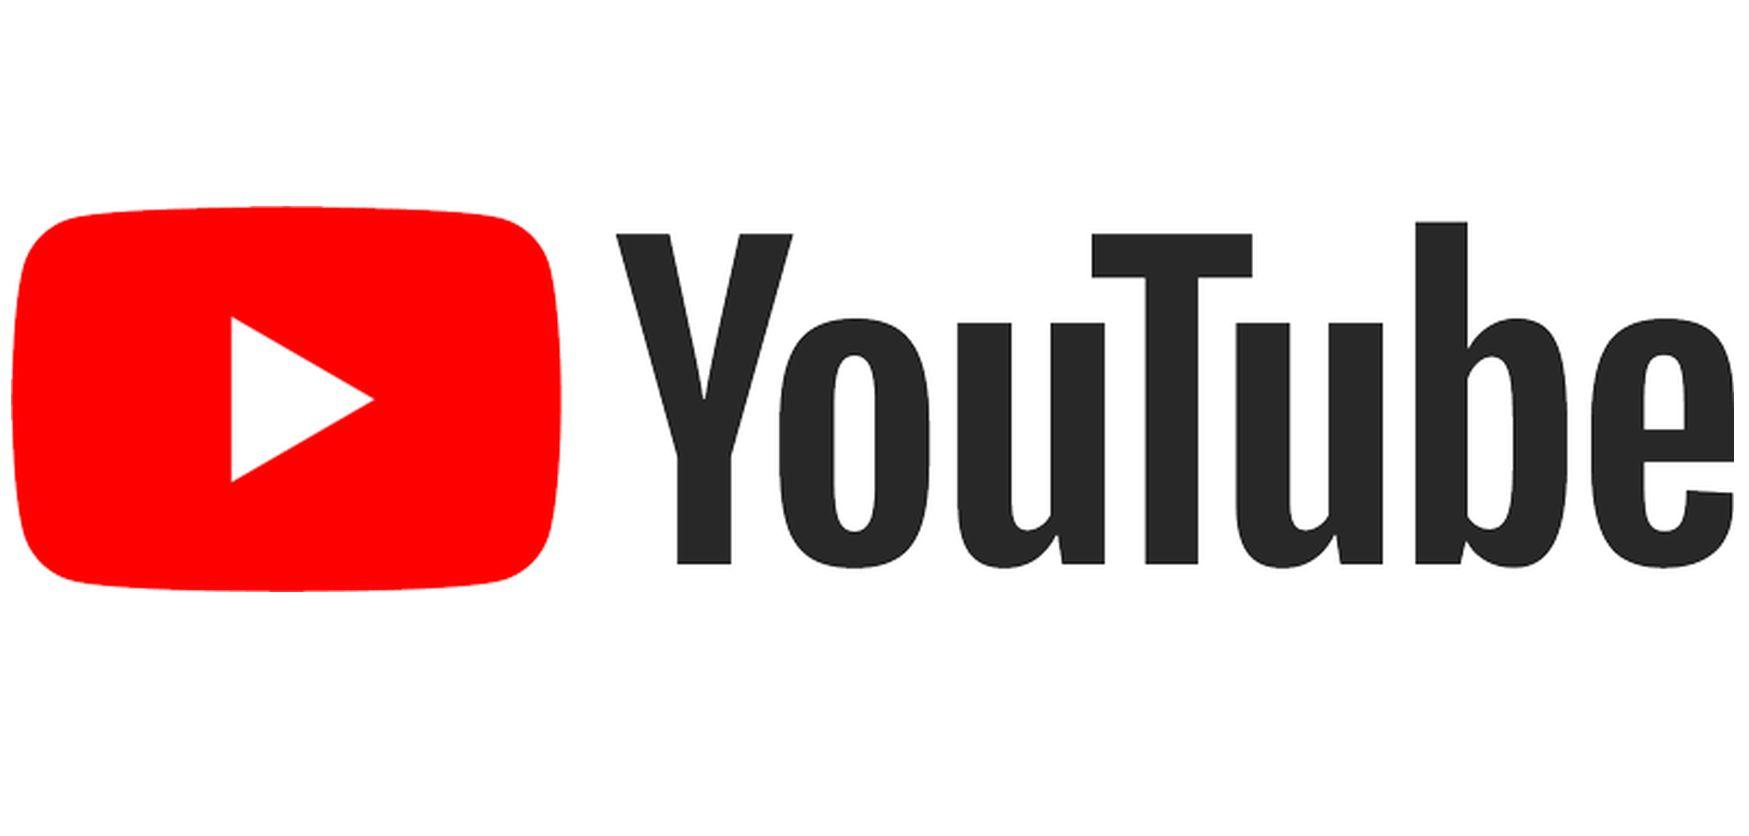 Why YouTube Rewind is trash